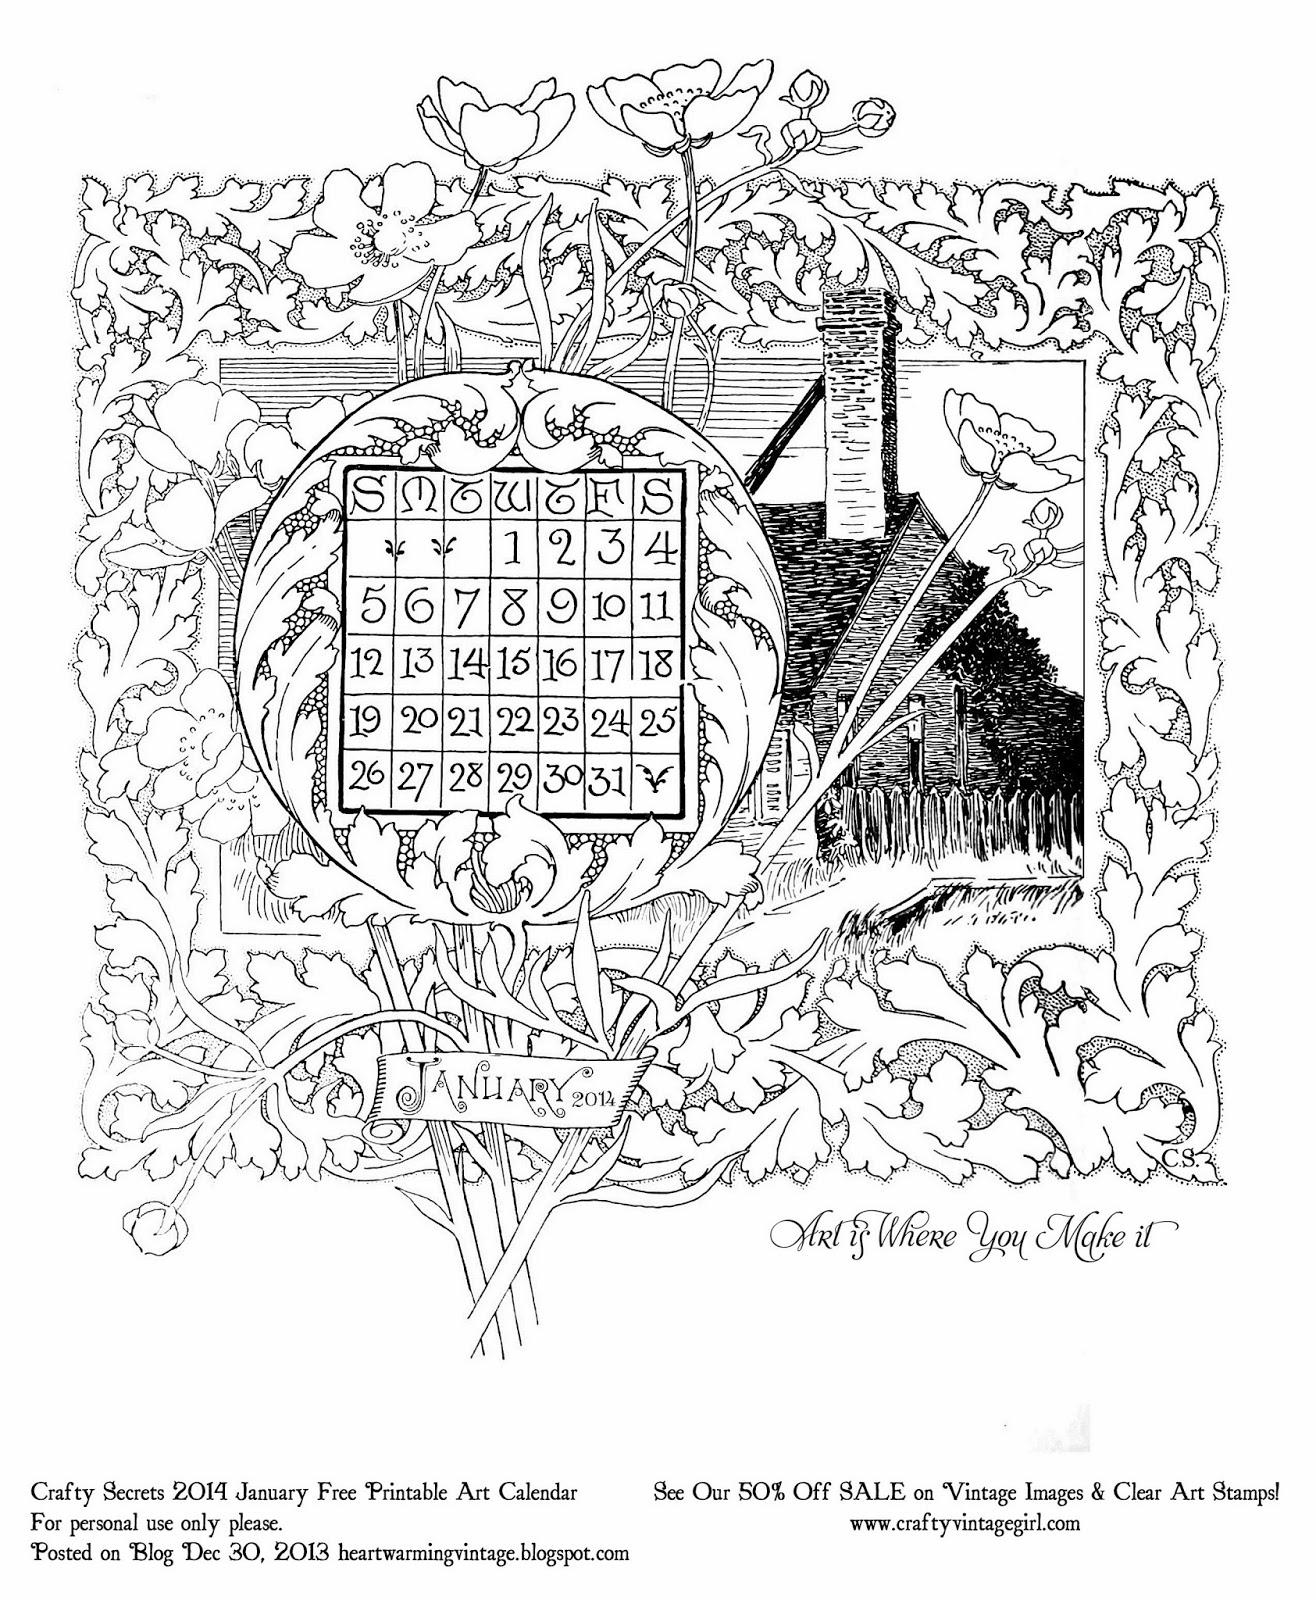 Crafty Secrets Heartwarming Vintage Ideas And Tips Free Printable January Art Calendar